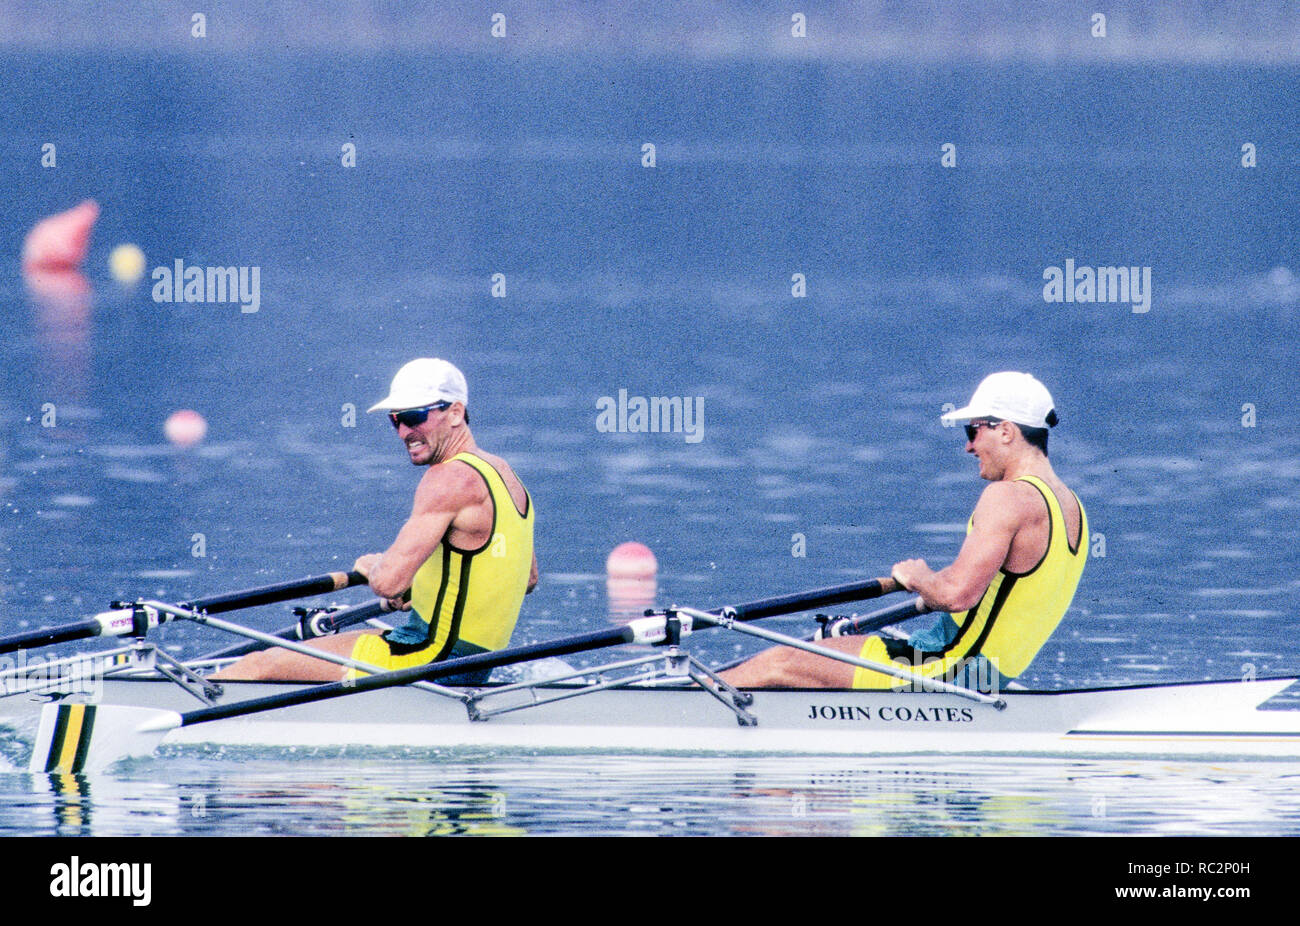 Barcelona Olympics 1992 - Lake Banyoles, SPAIN, AUS M2X  stroke, ANTONIE Peter, HAWKINS Stephen Mark,  Photo: Peter Spurrier Stock Photo